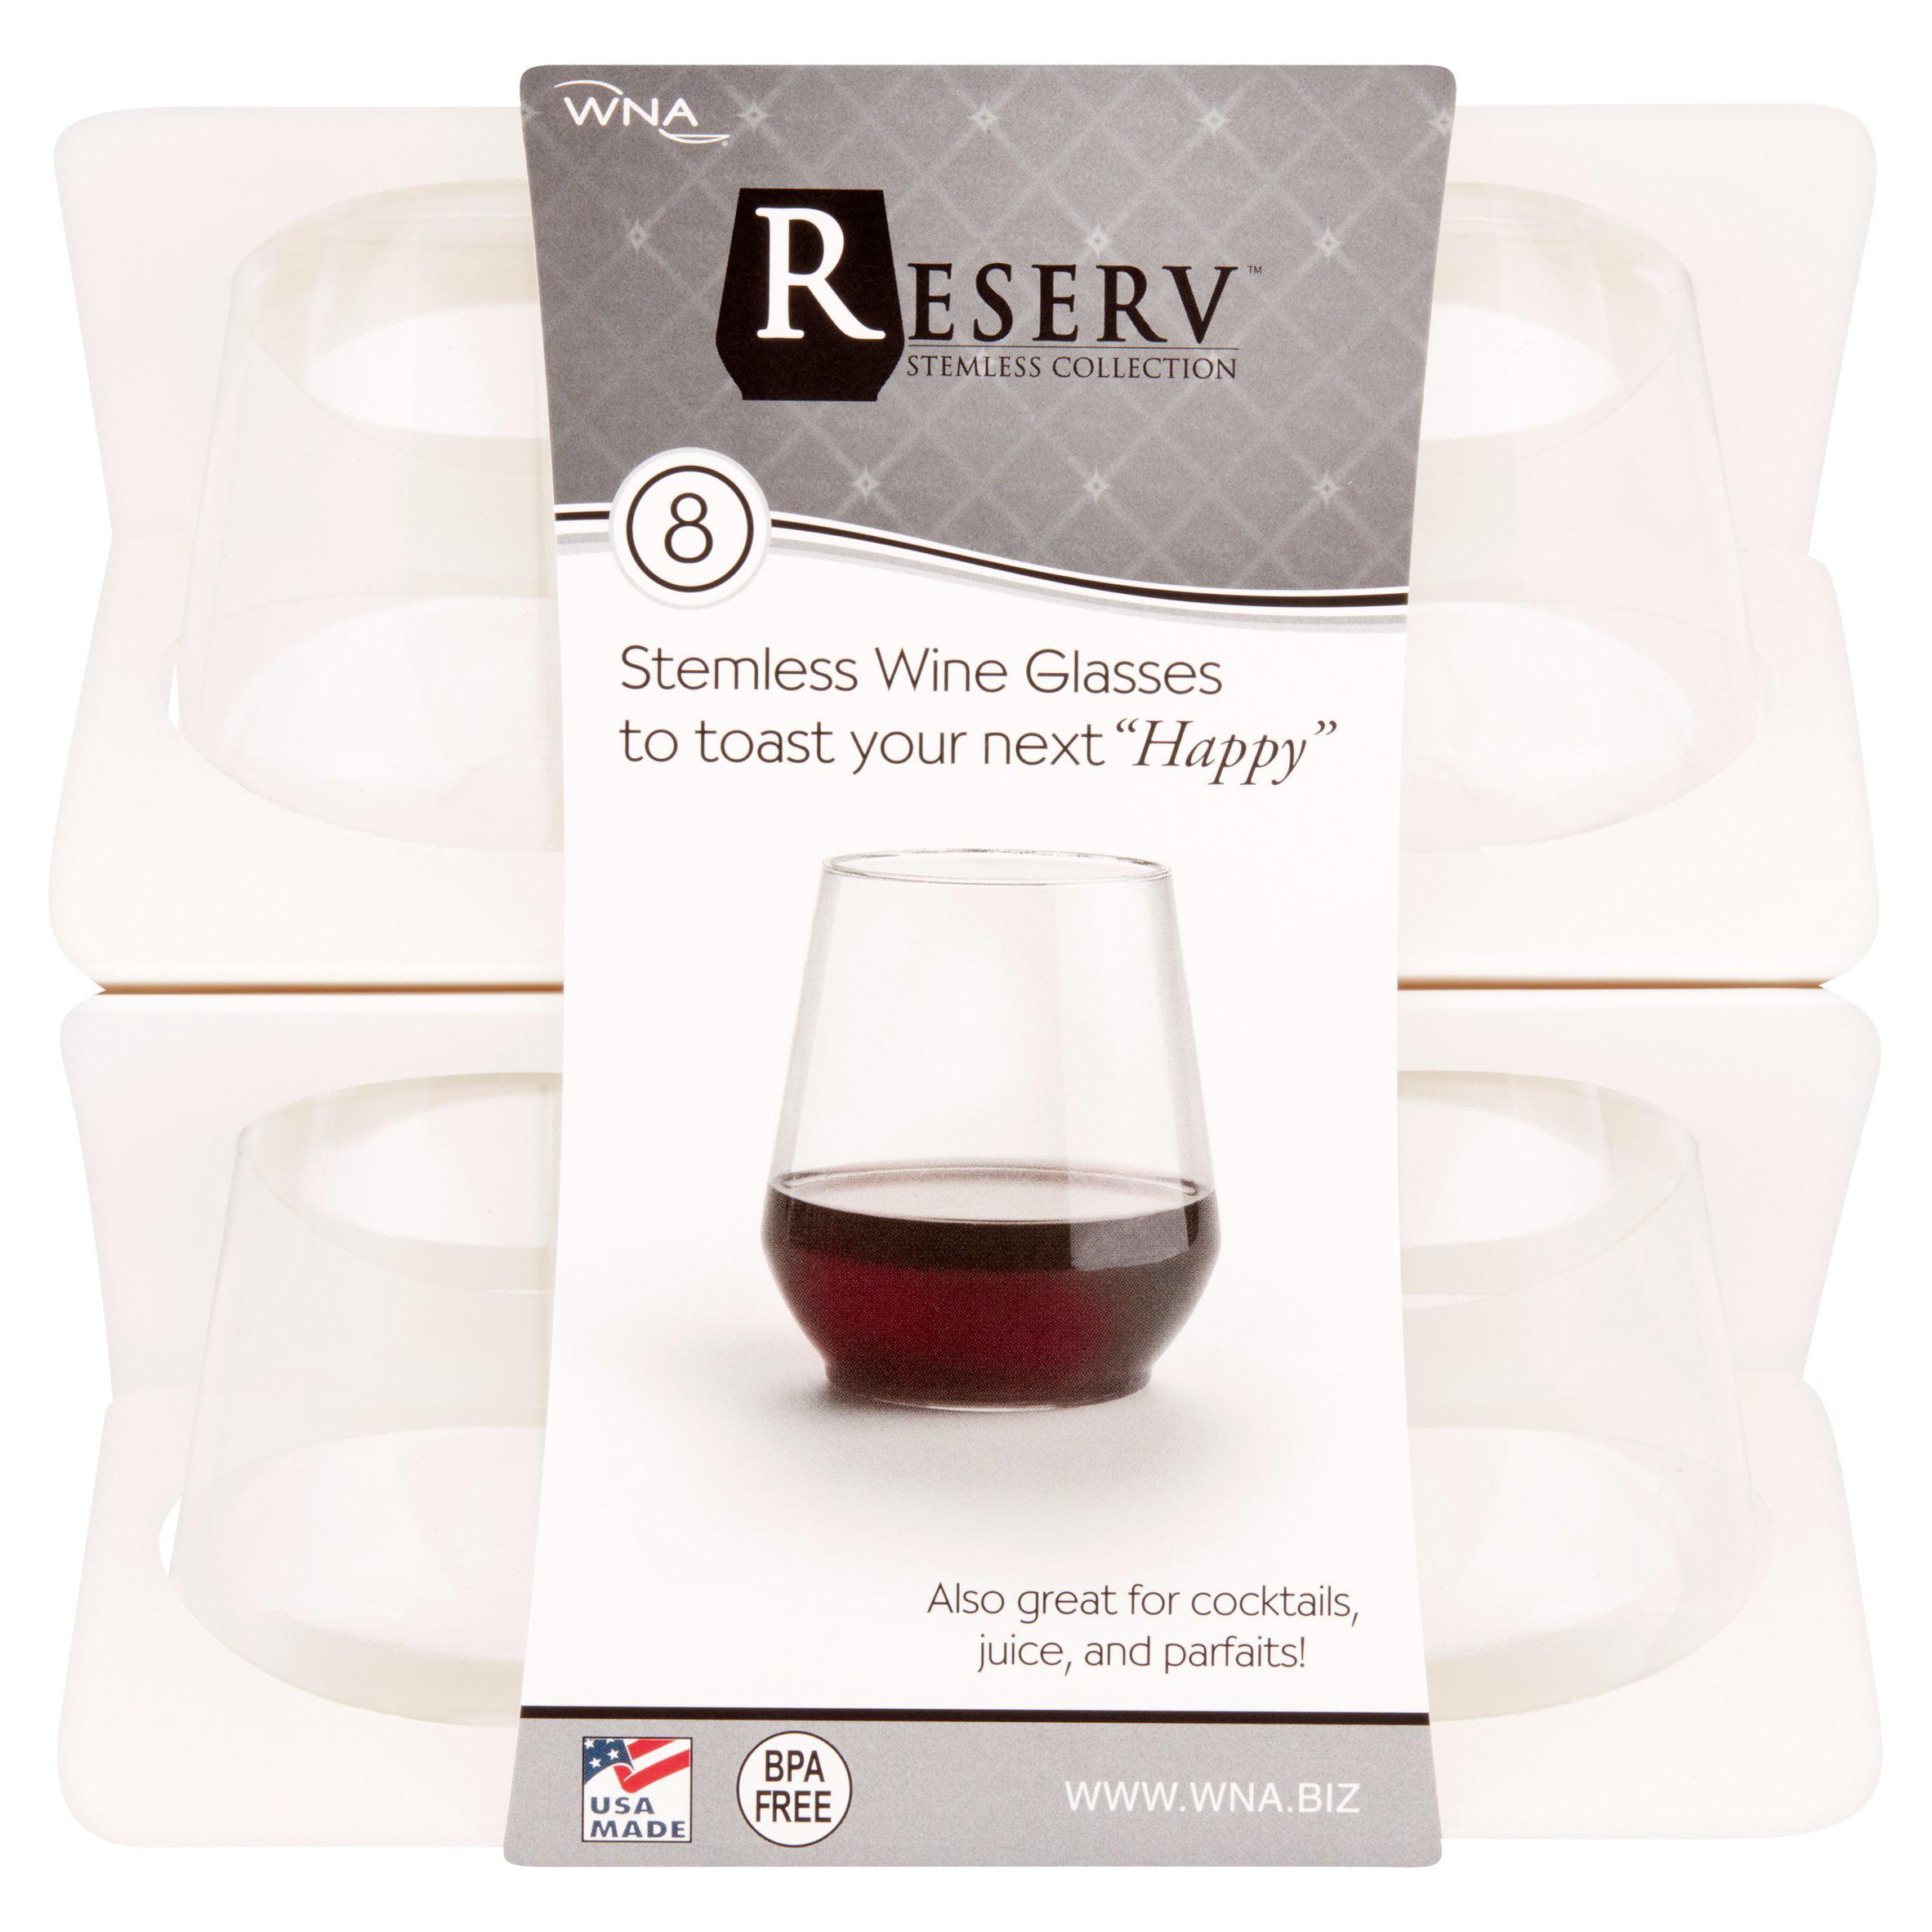 Reserve Plastic Stemless Plastic Wine Glasses, 8 count - Walmart.com